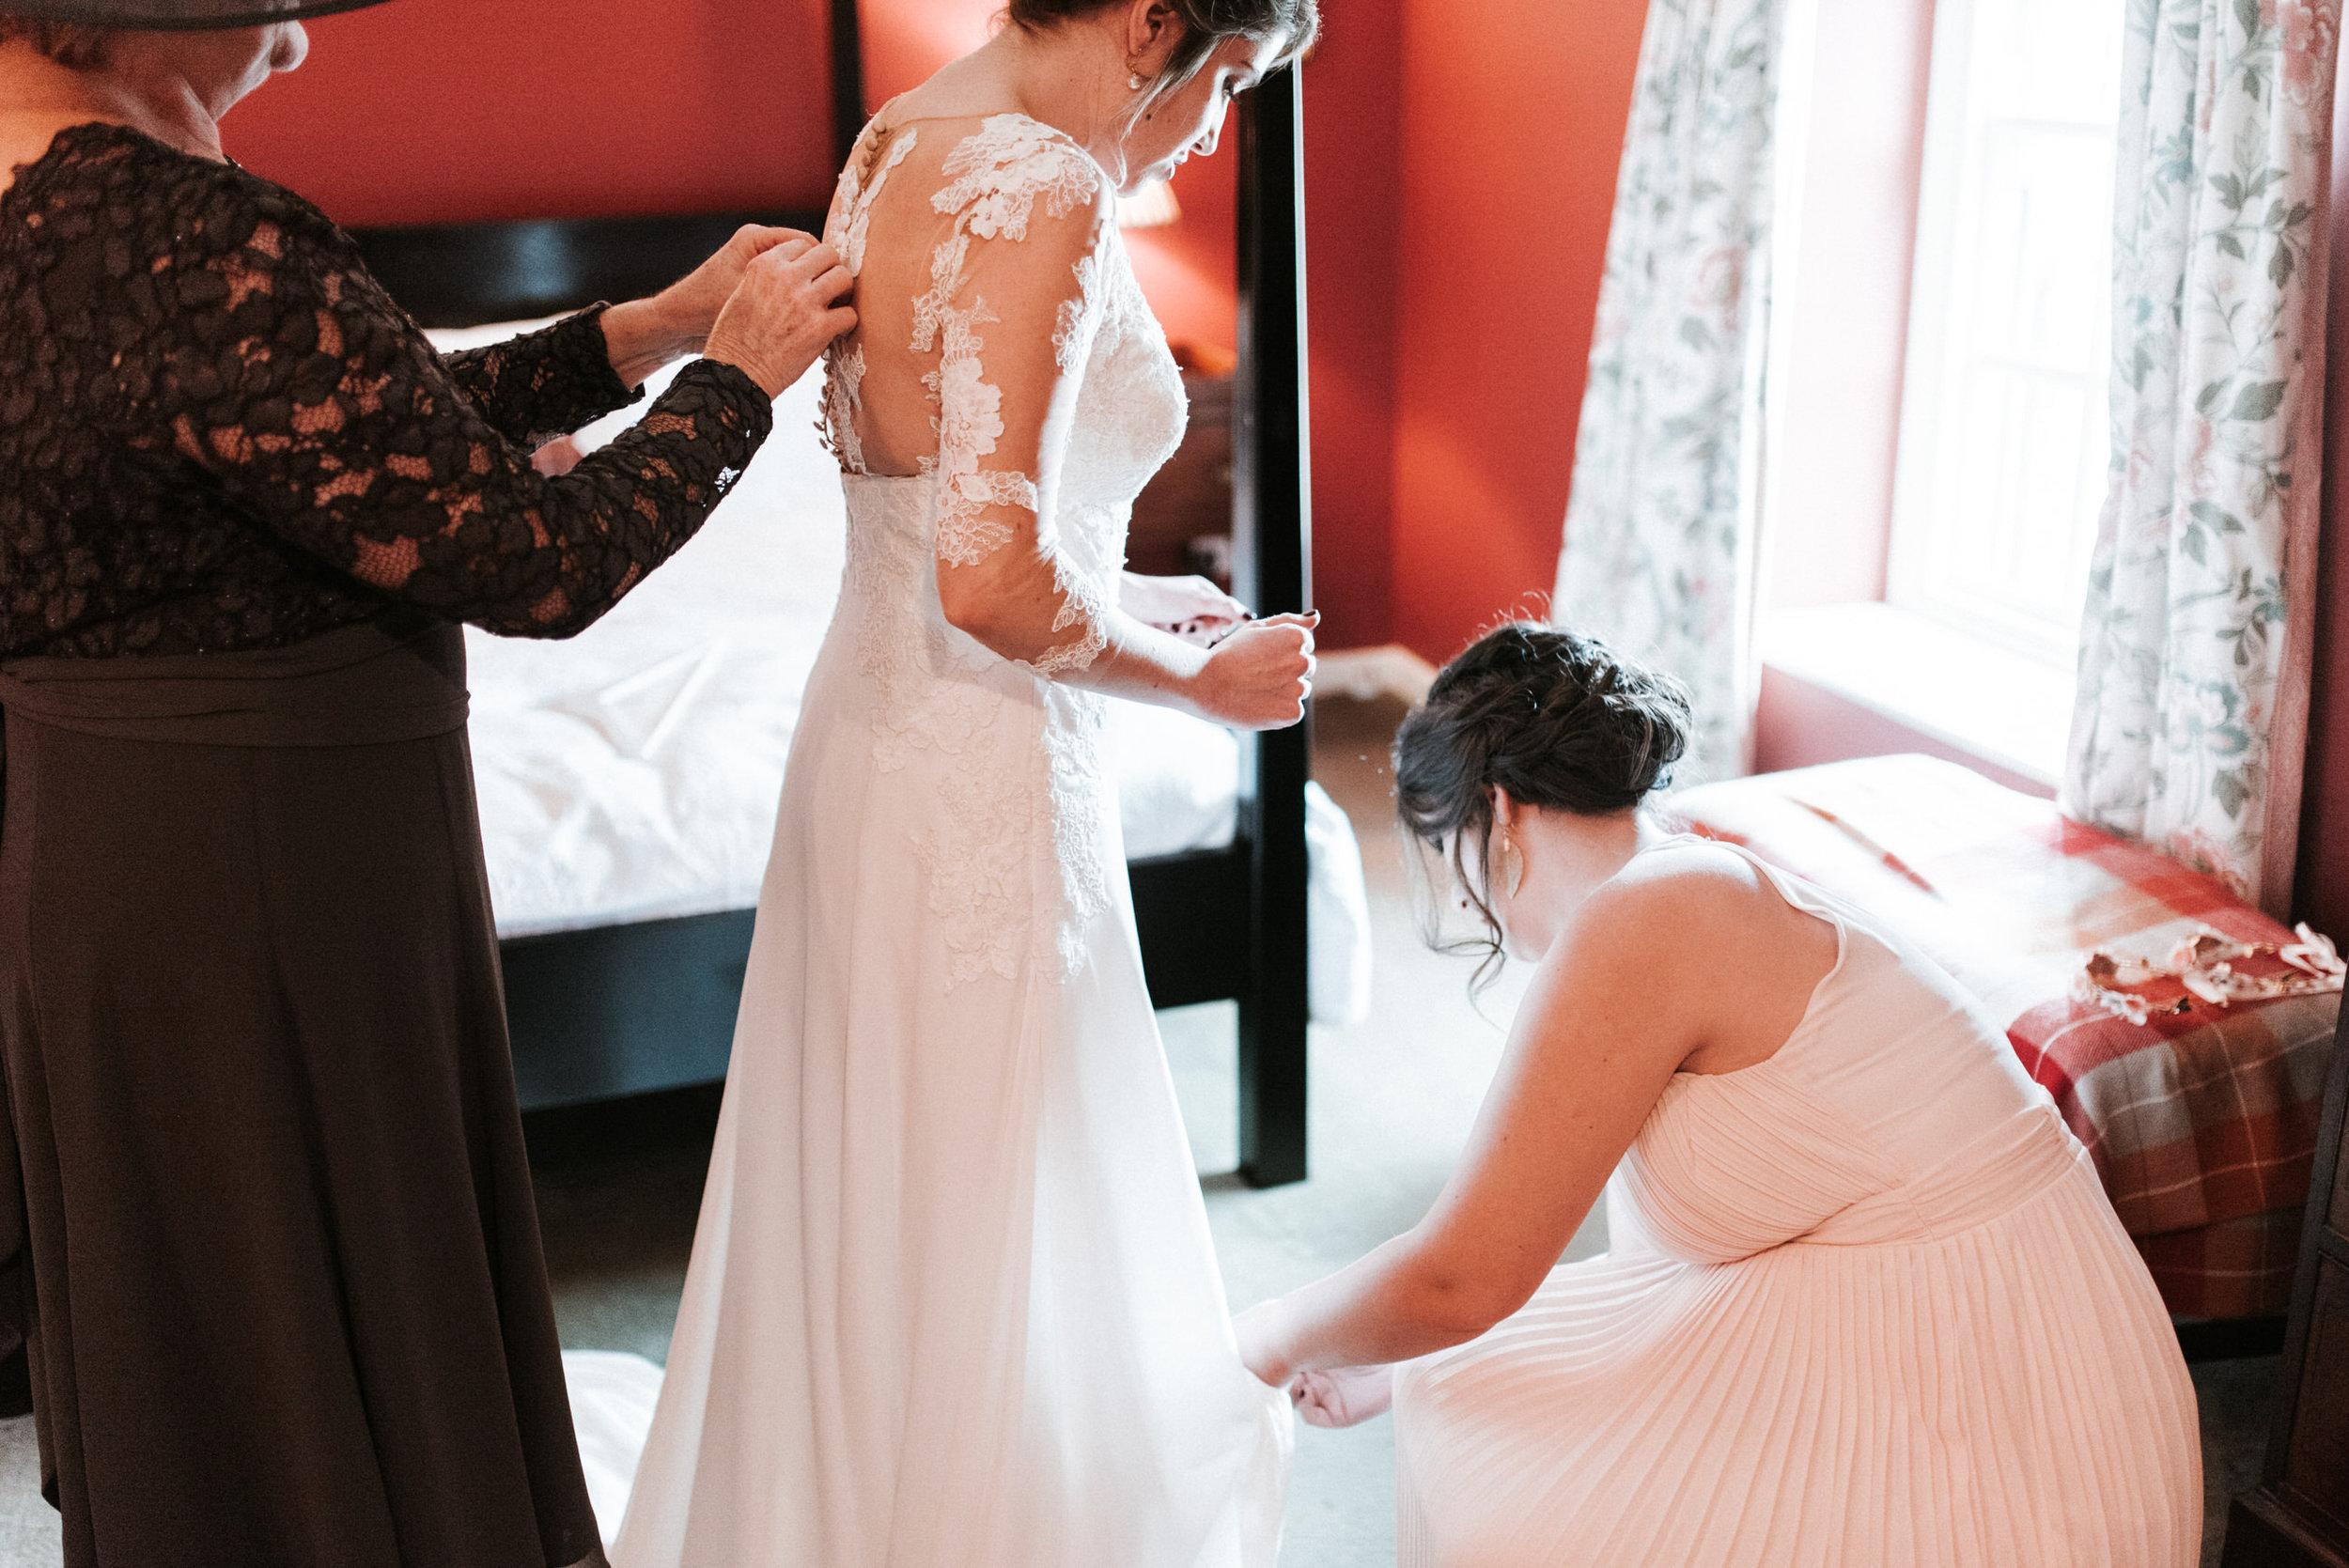 lissanoure castle wedding, northern ireland wedding photographer, romantic northern irish wedding venue, castle wedding ireland, natural wedding photography ni (32).jpg